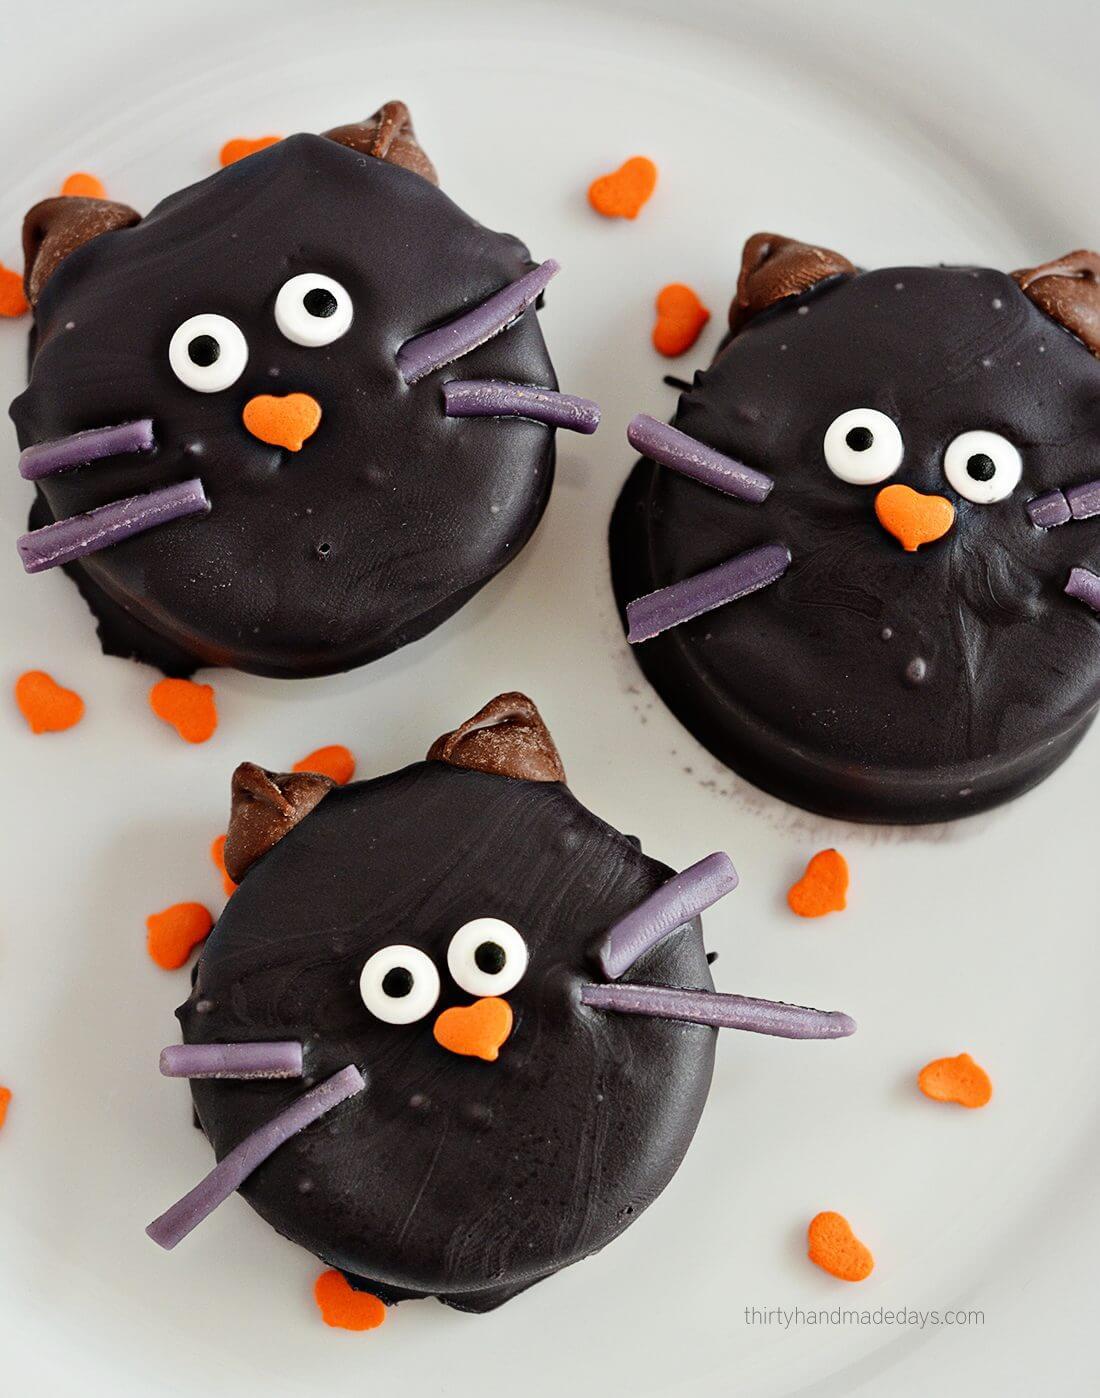 Make cute Halloween Oreo Kitties! Easy how to from www.thirtyhandmadedays.com